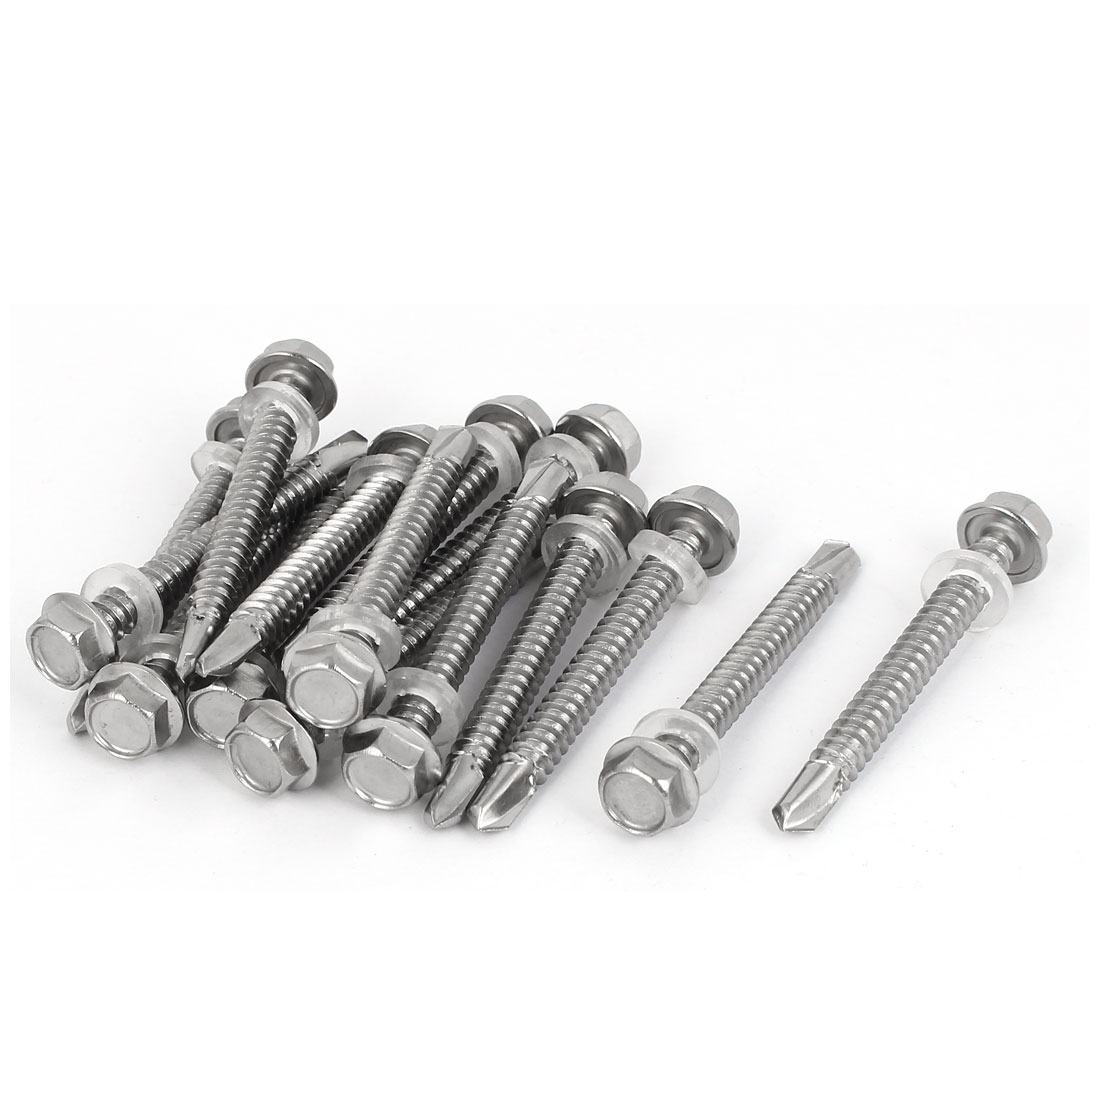 M6.3 x 55mm Thread 410 Stainless Steel Self Drilling Tek Screw w Washer 15 Pcs